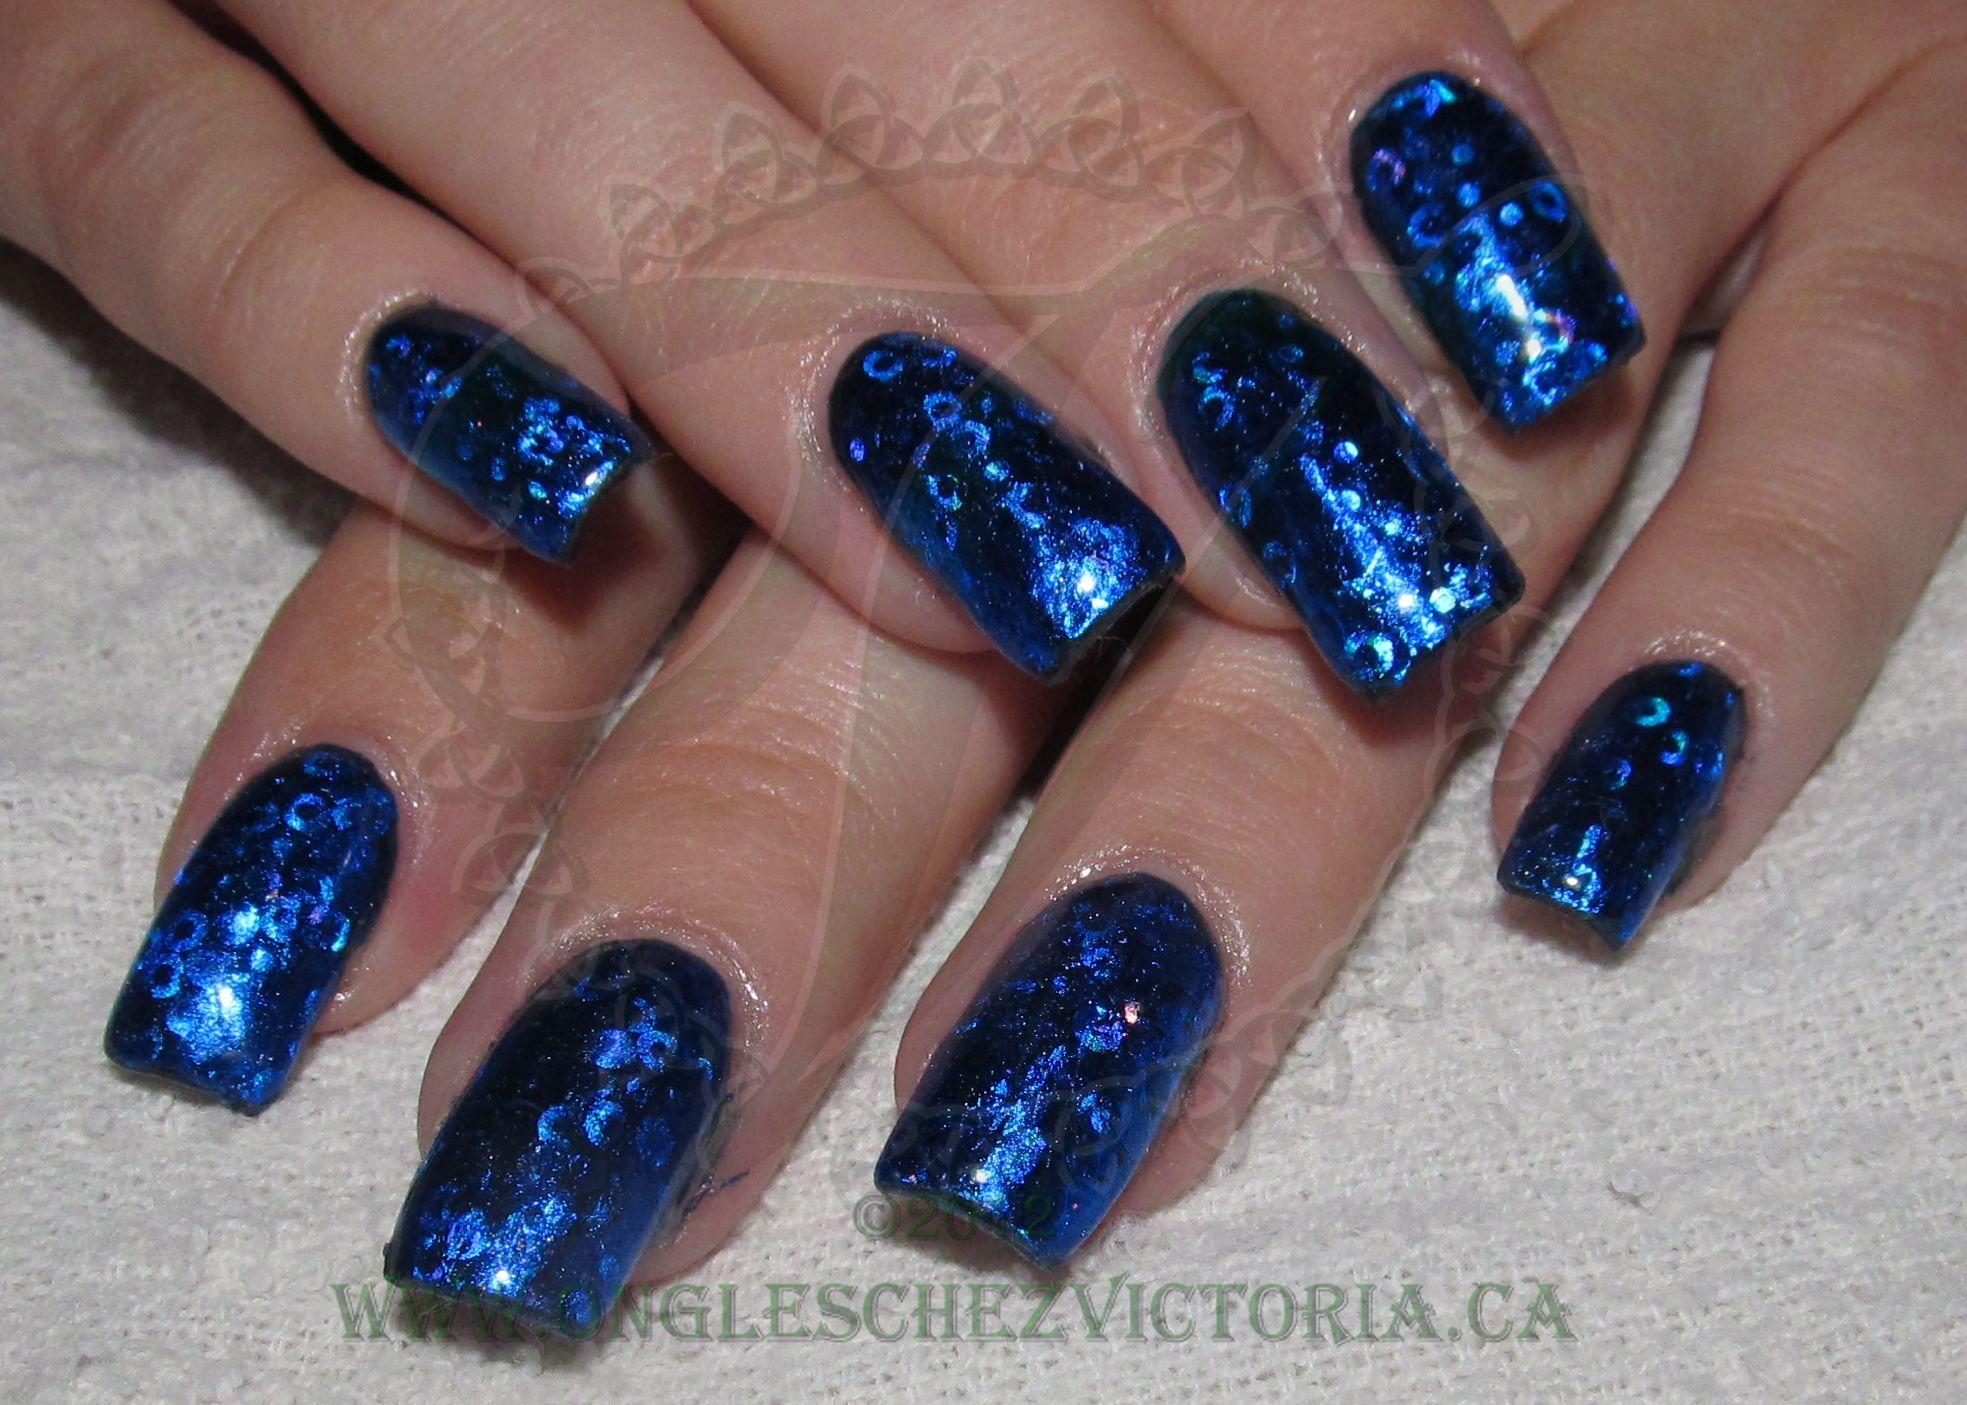 Acrylic overlay with blue Transfer foils